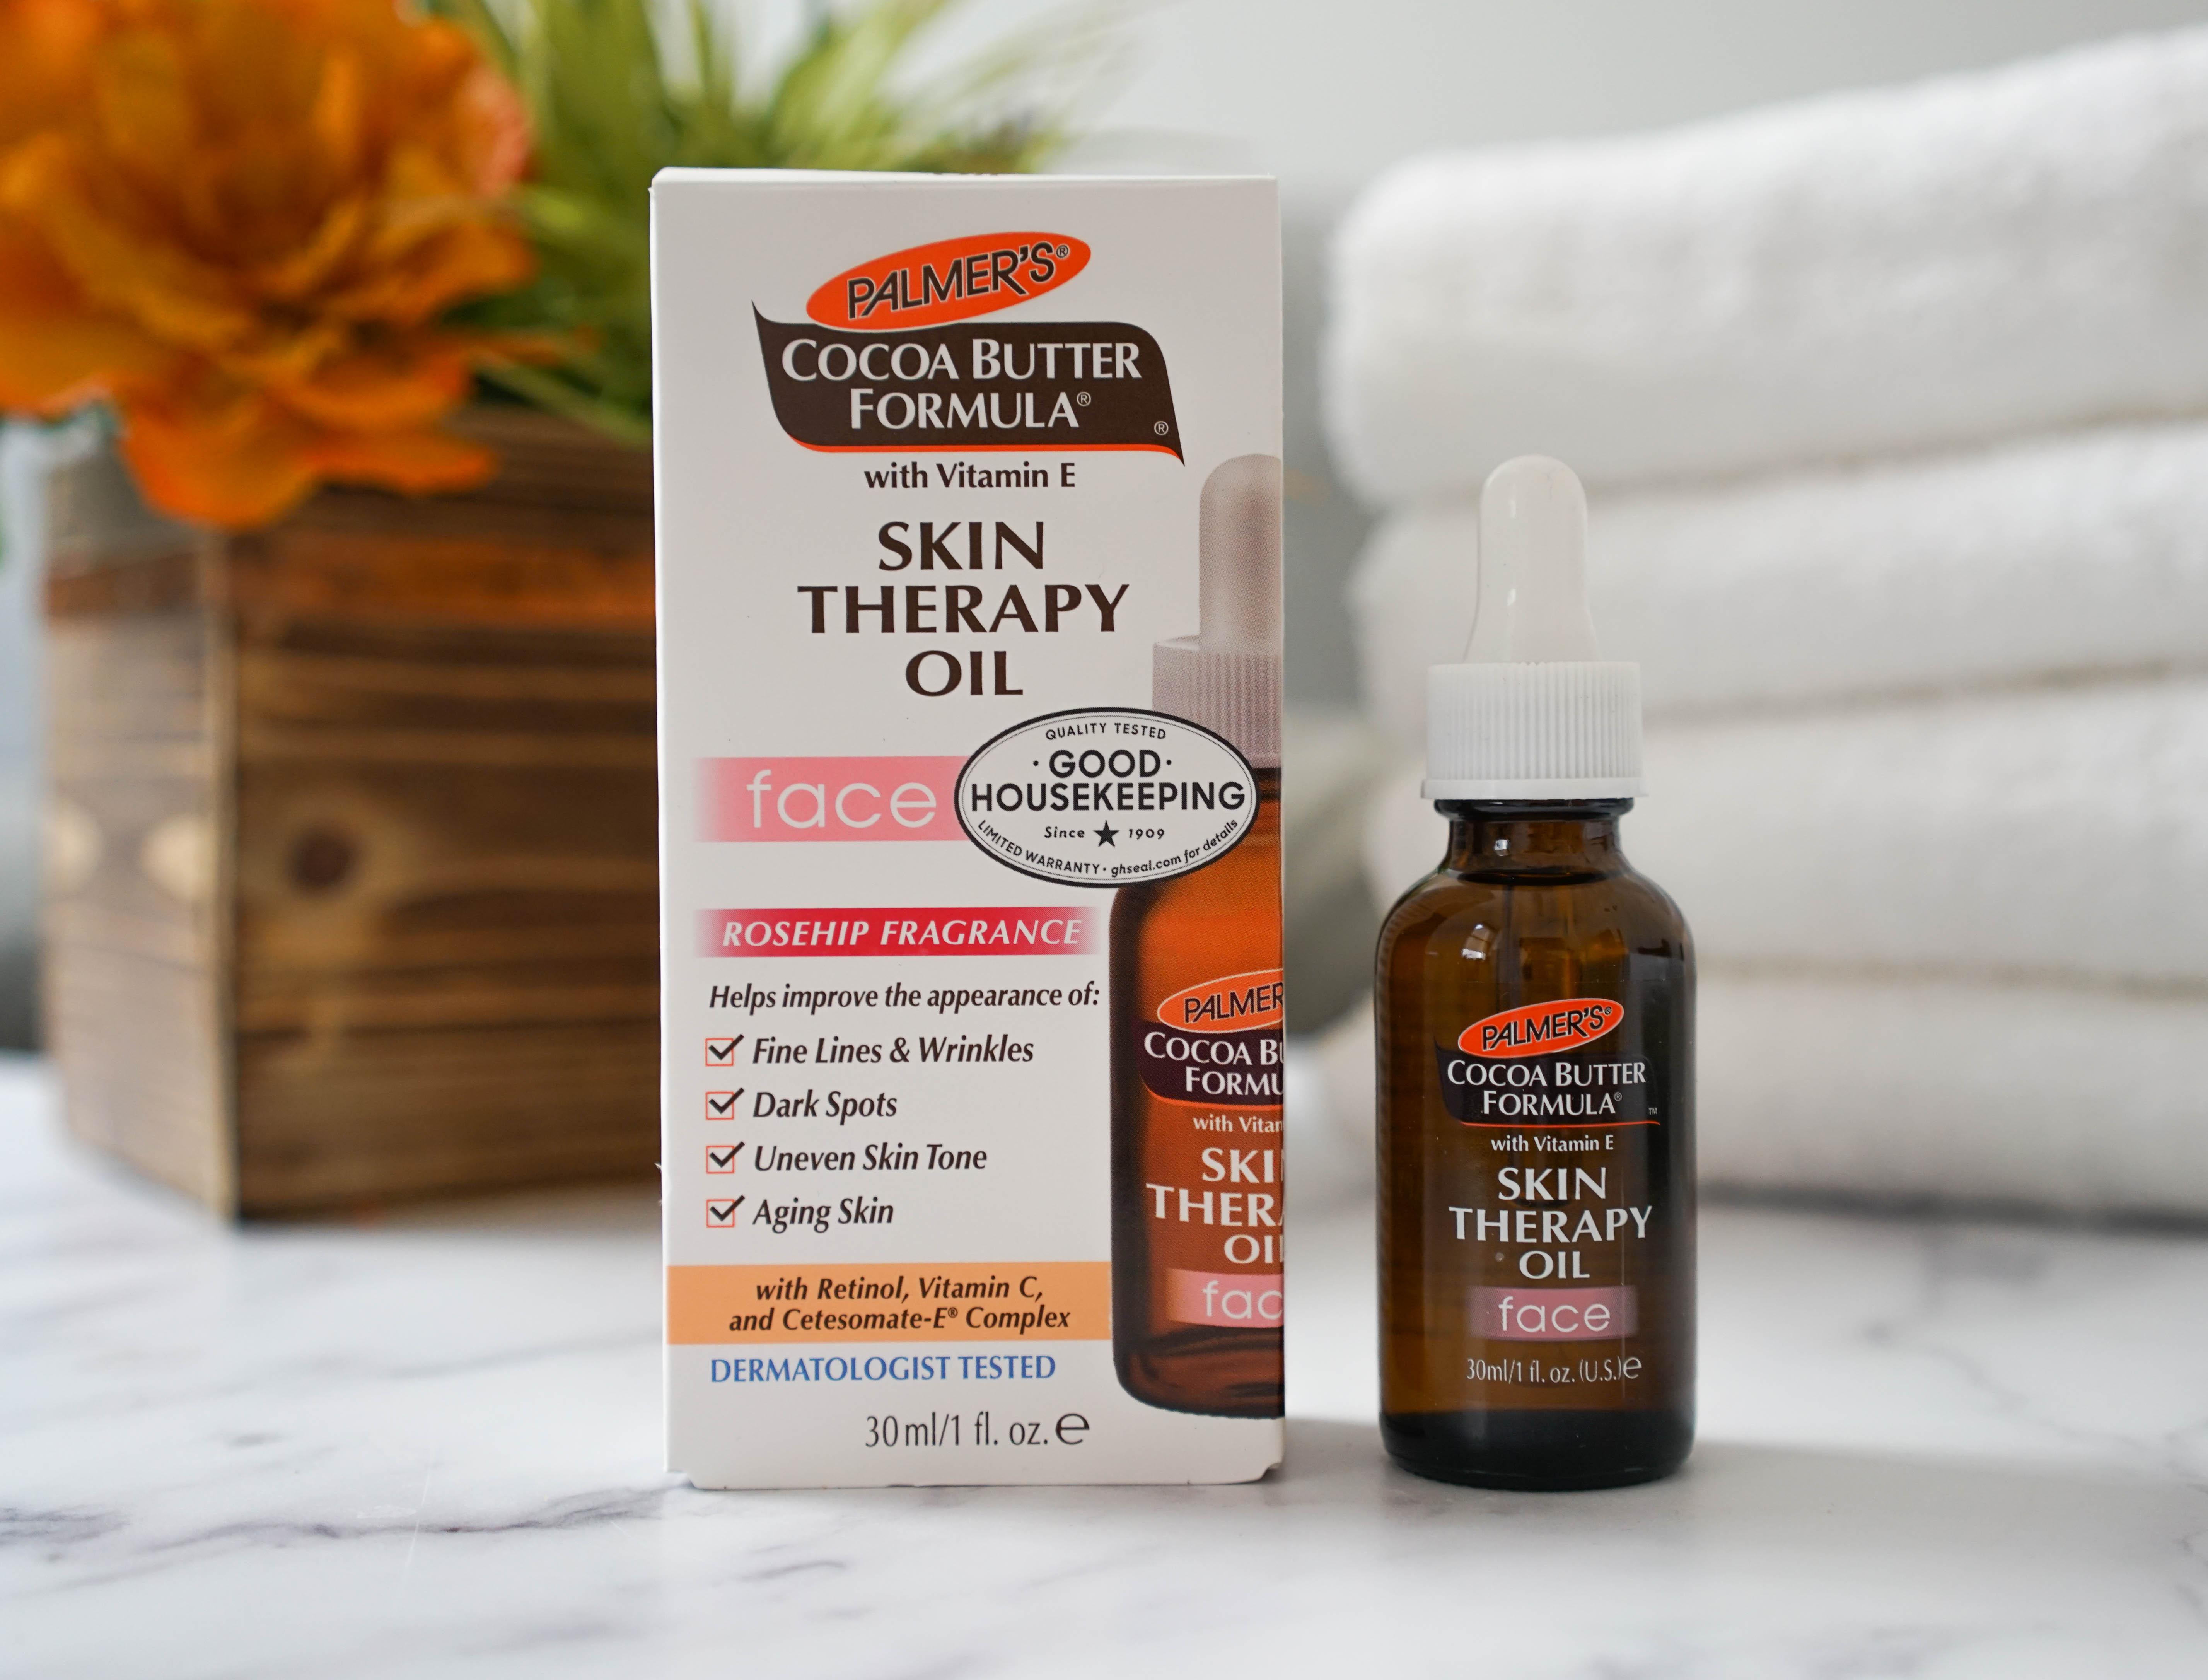 Palmer's Cocoa Butter Formula Skin Therapy Oil Face Oil